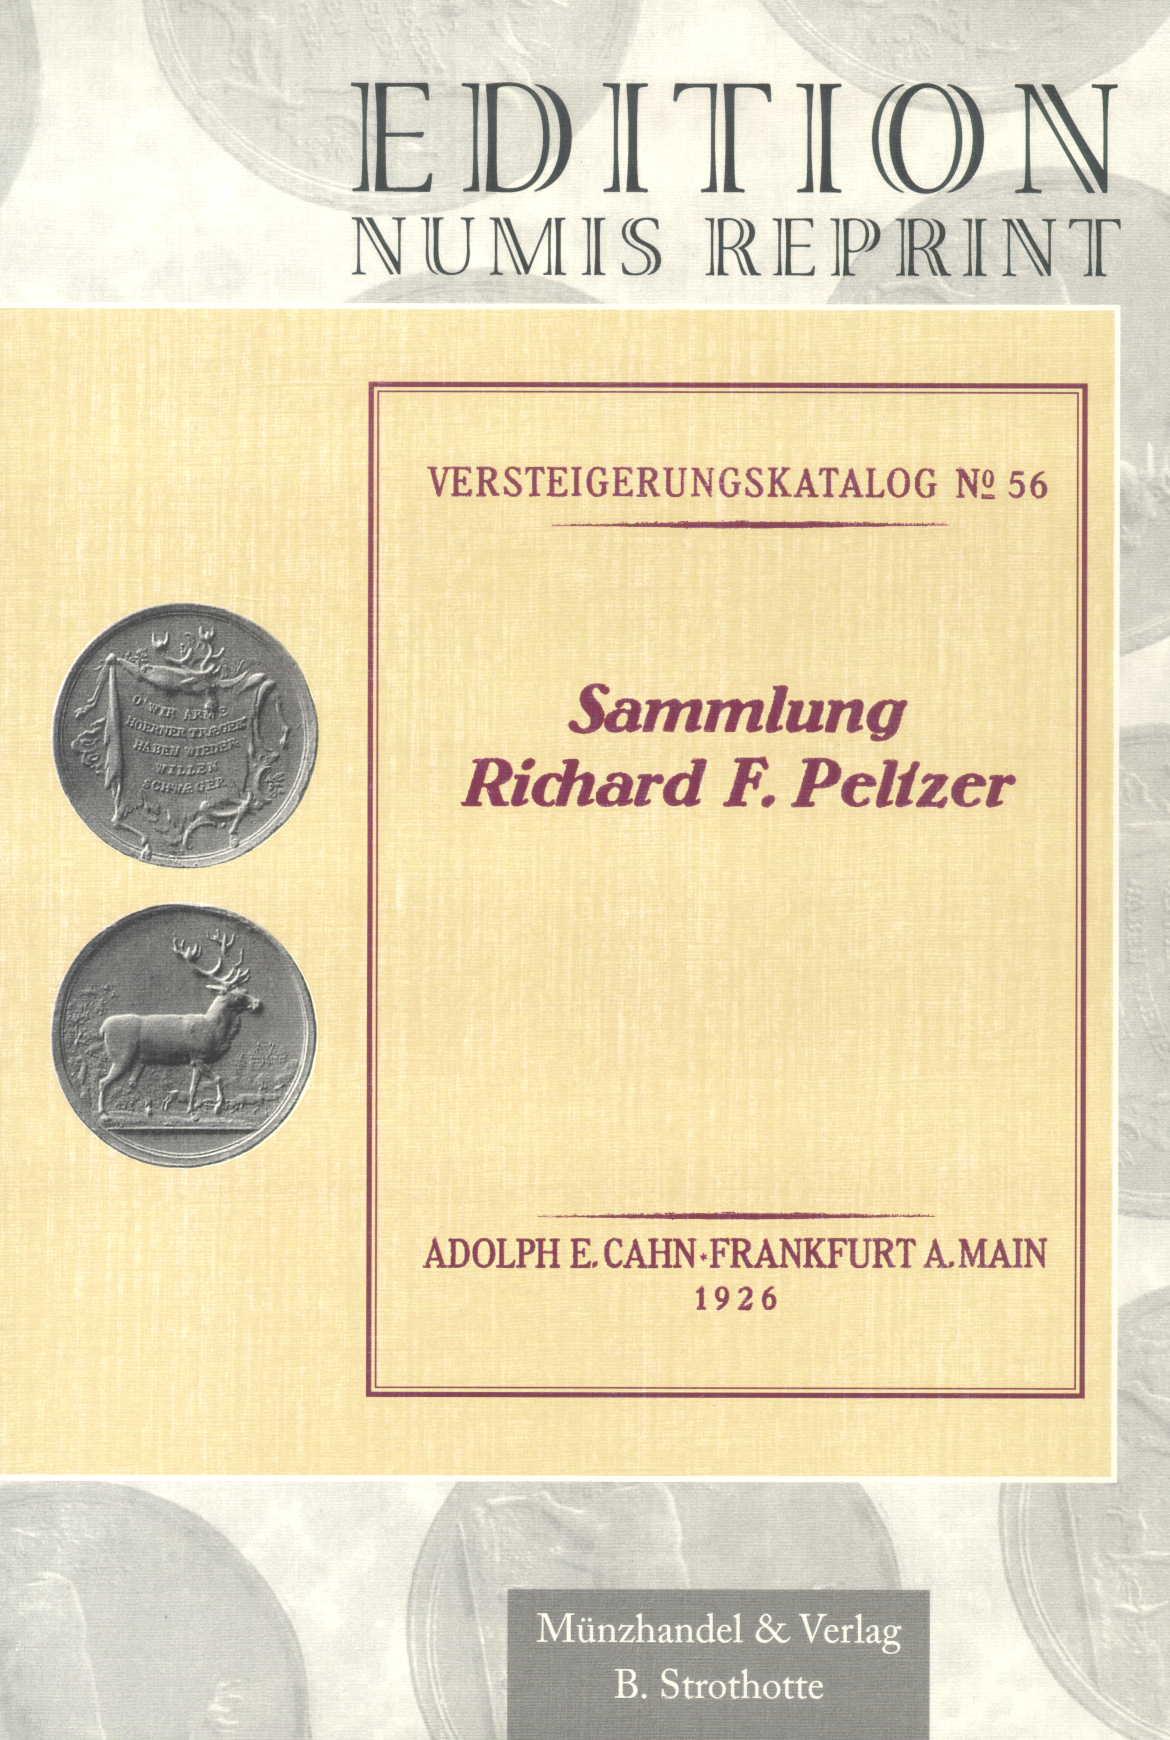 Peltzer, Richard F. (Sammlung): I. Freimaurermedaillen / Freimau